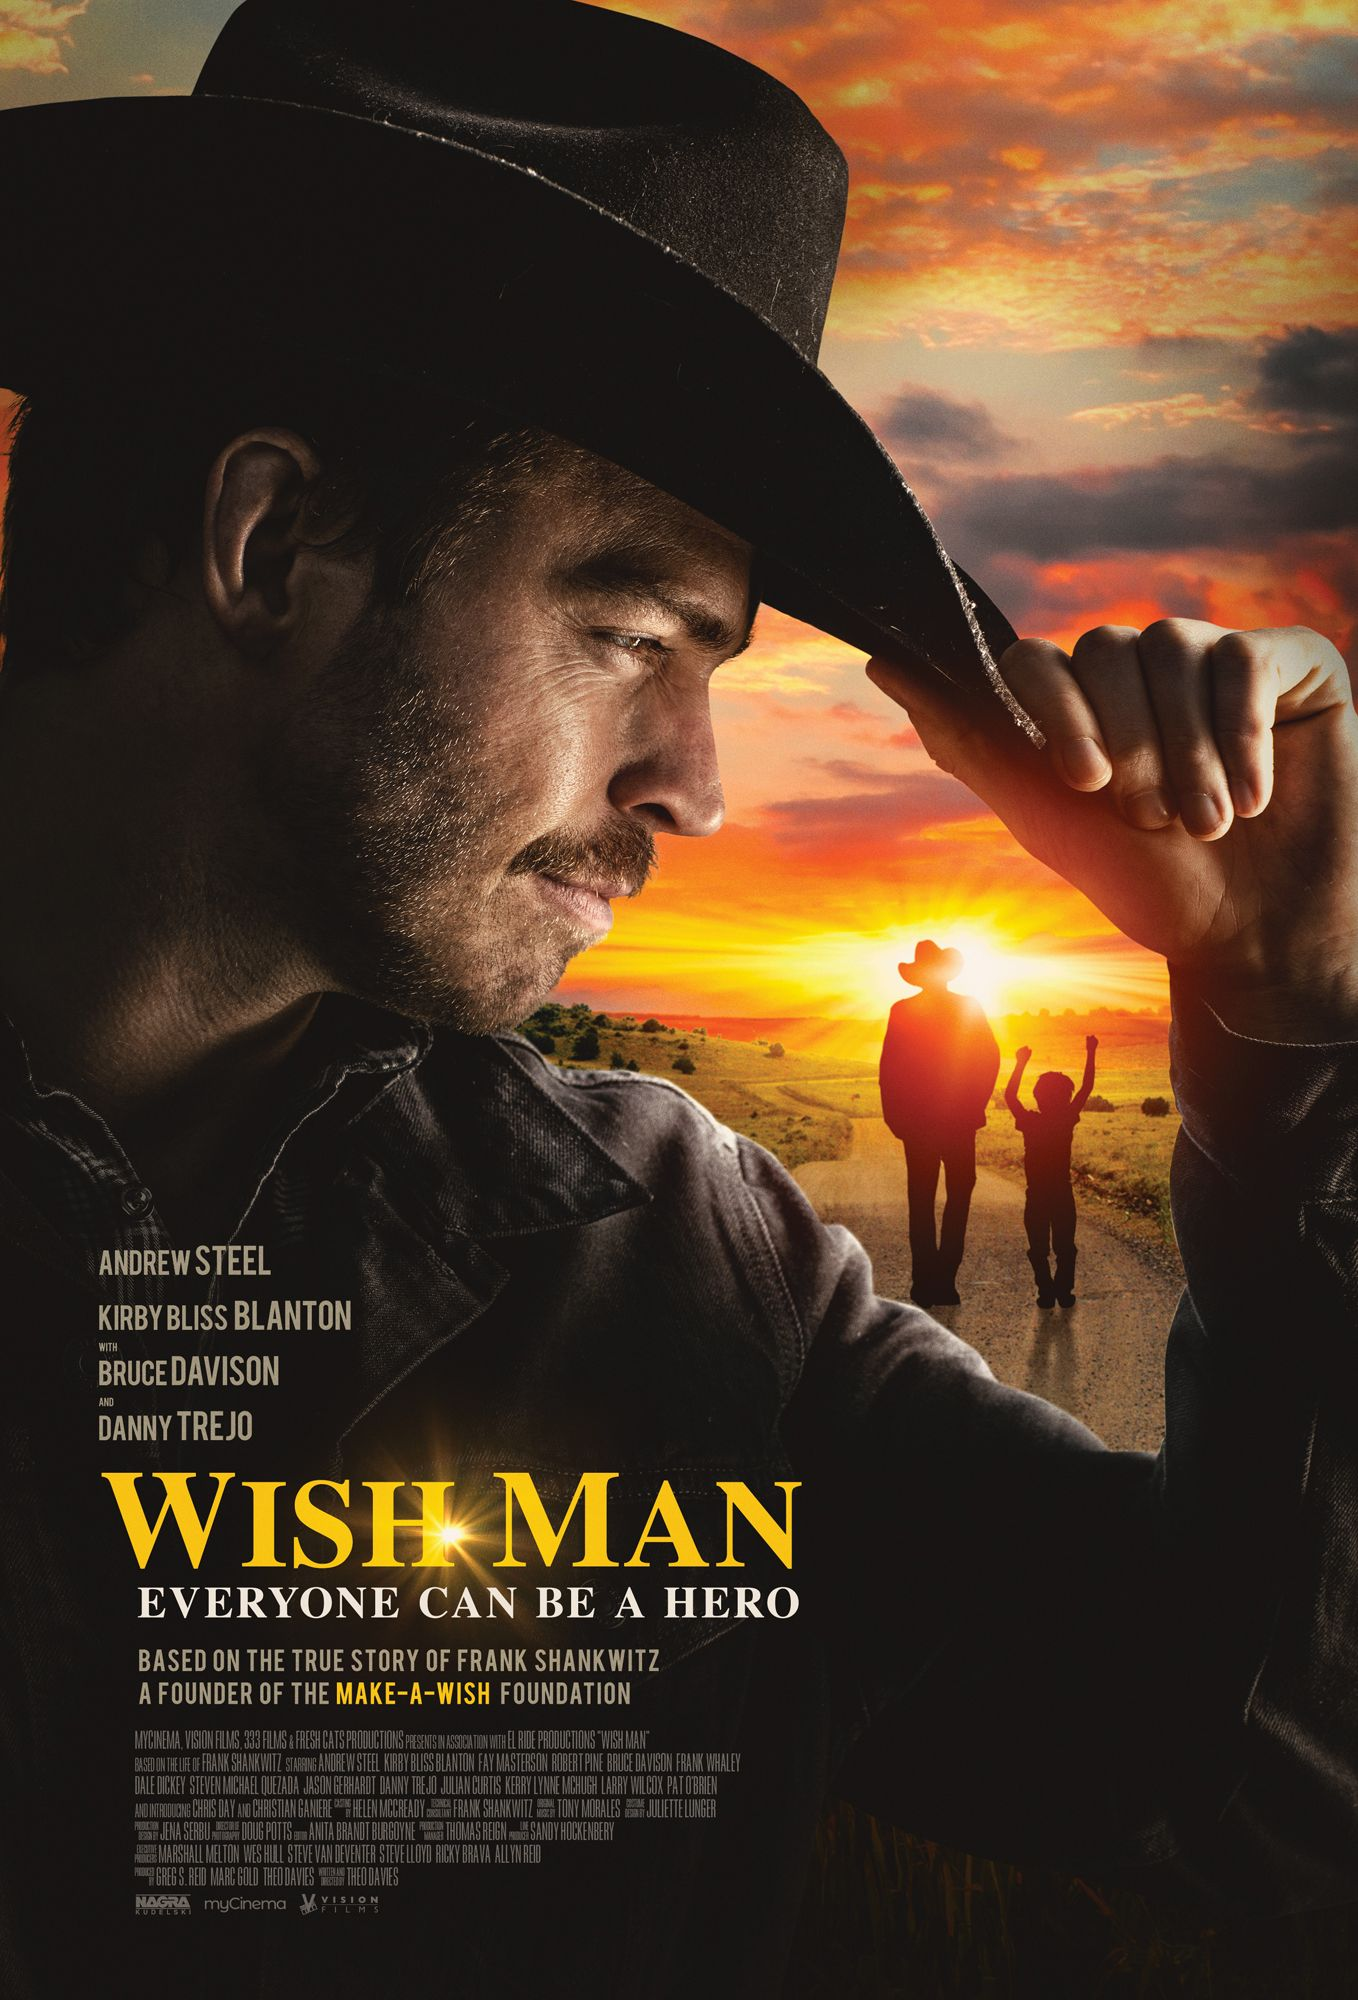 Nonton Movie Wish Man Subtitle Indonesia #nontonmovie # ...